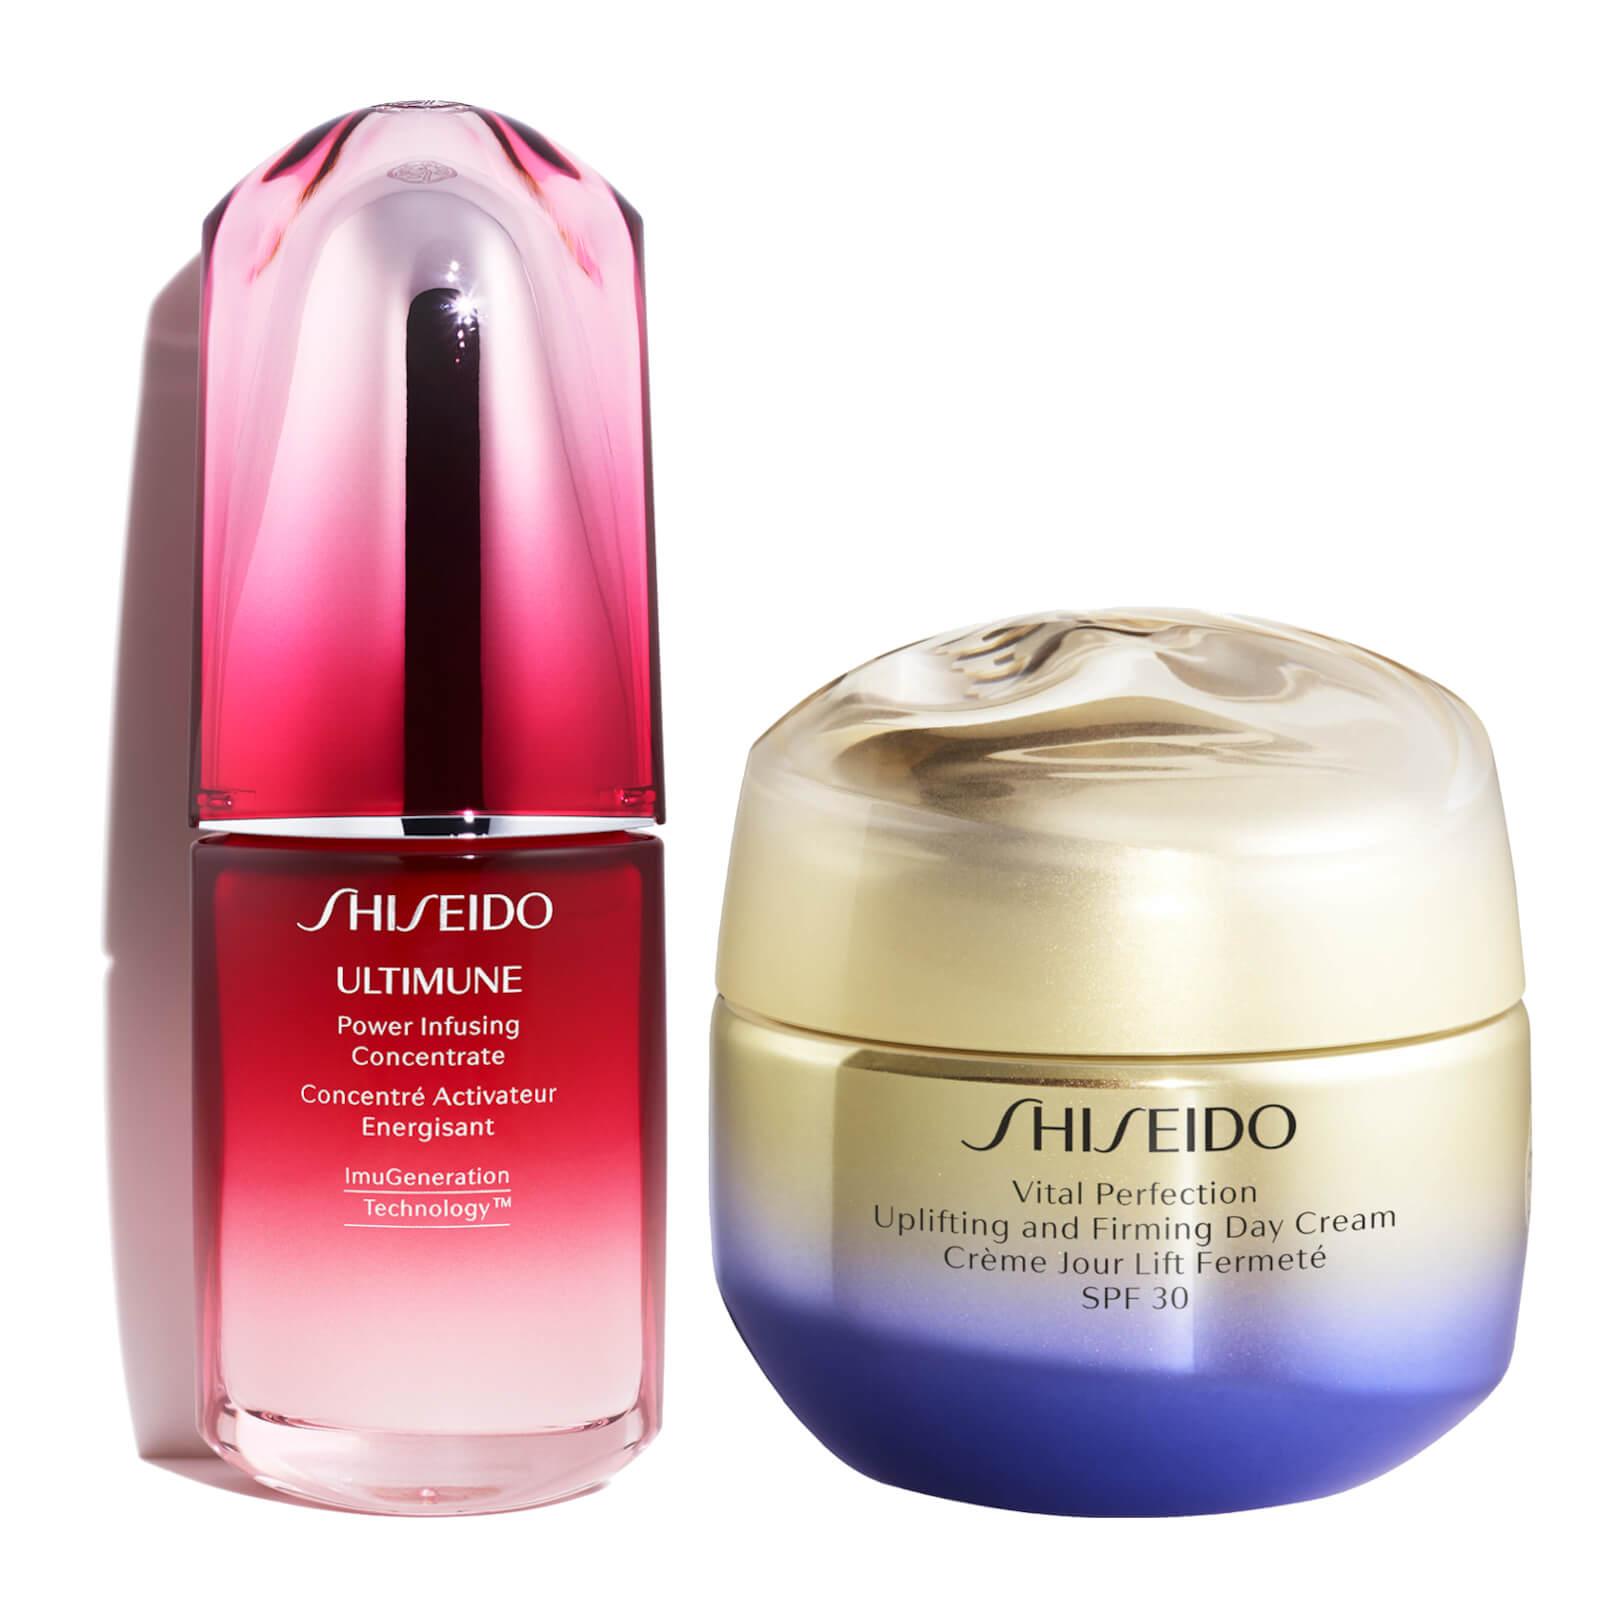 Купить Shiseido Vital Perfection Uplifting Day Cream and Ultimune 30ml Bundle